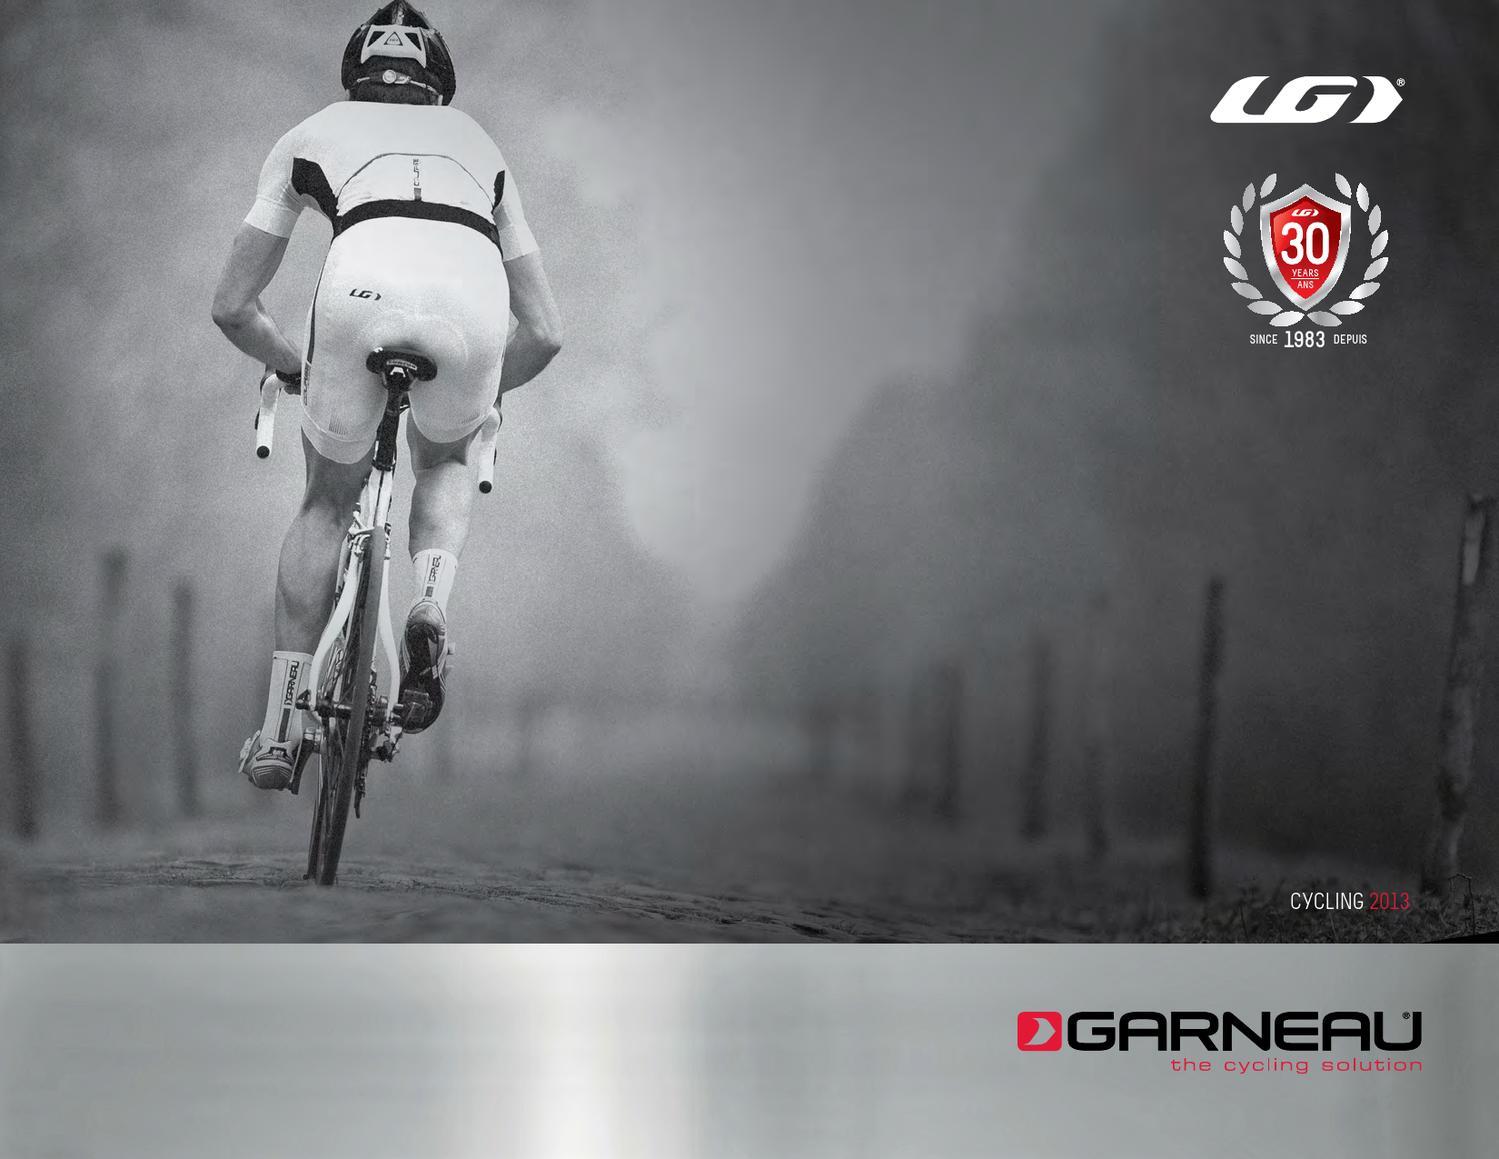 Black - L Louis Garneau 2012 Cycling Knee Warmers 1083040